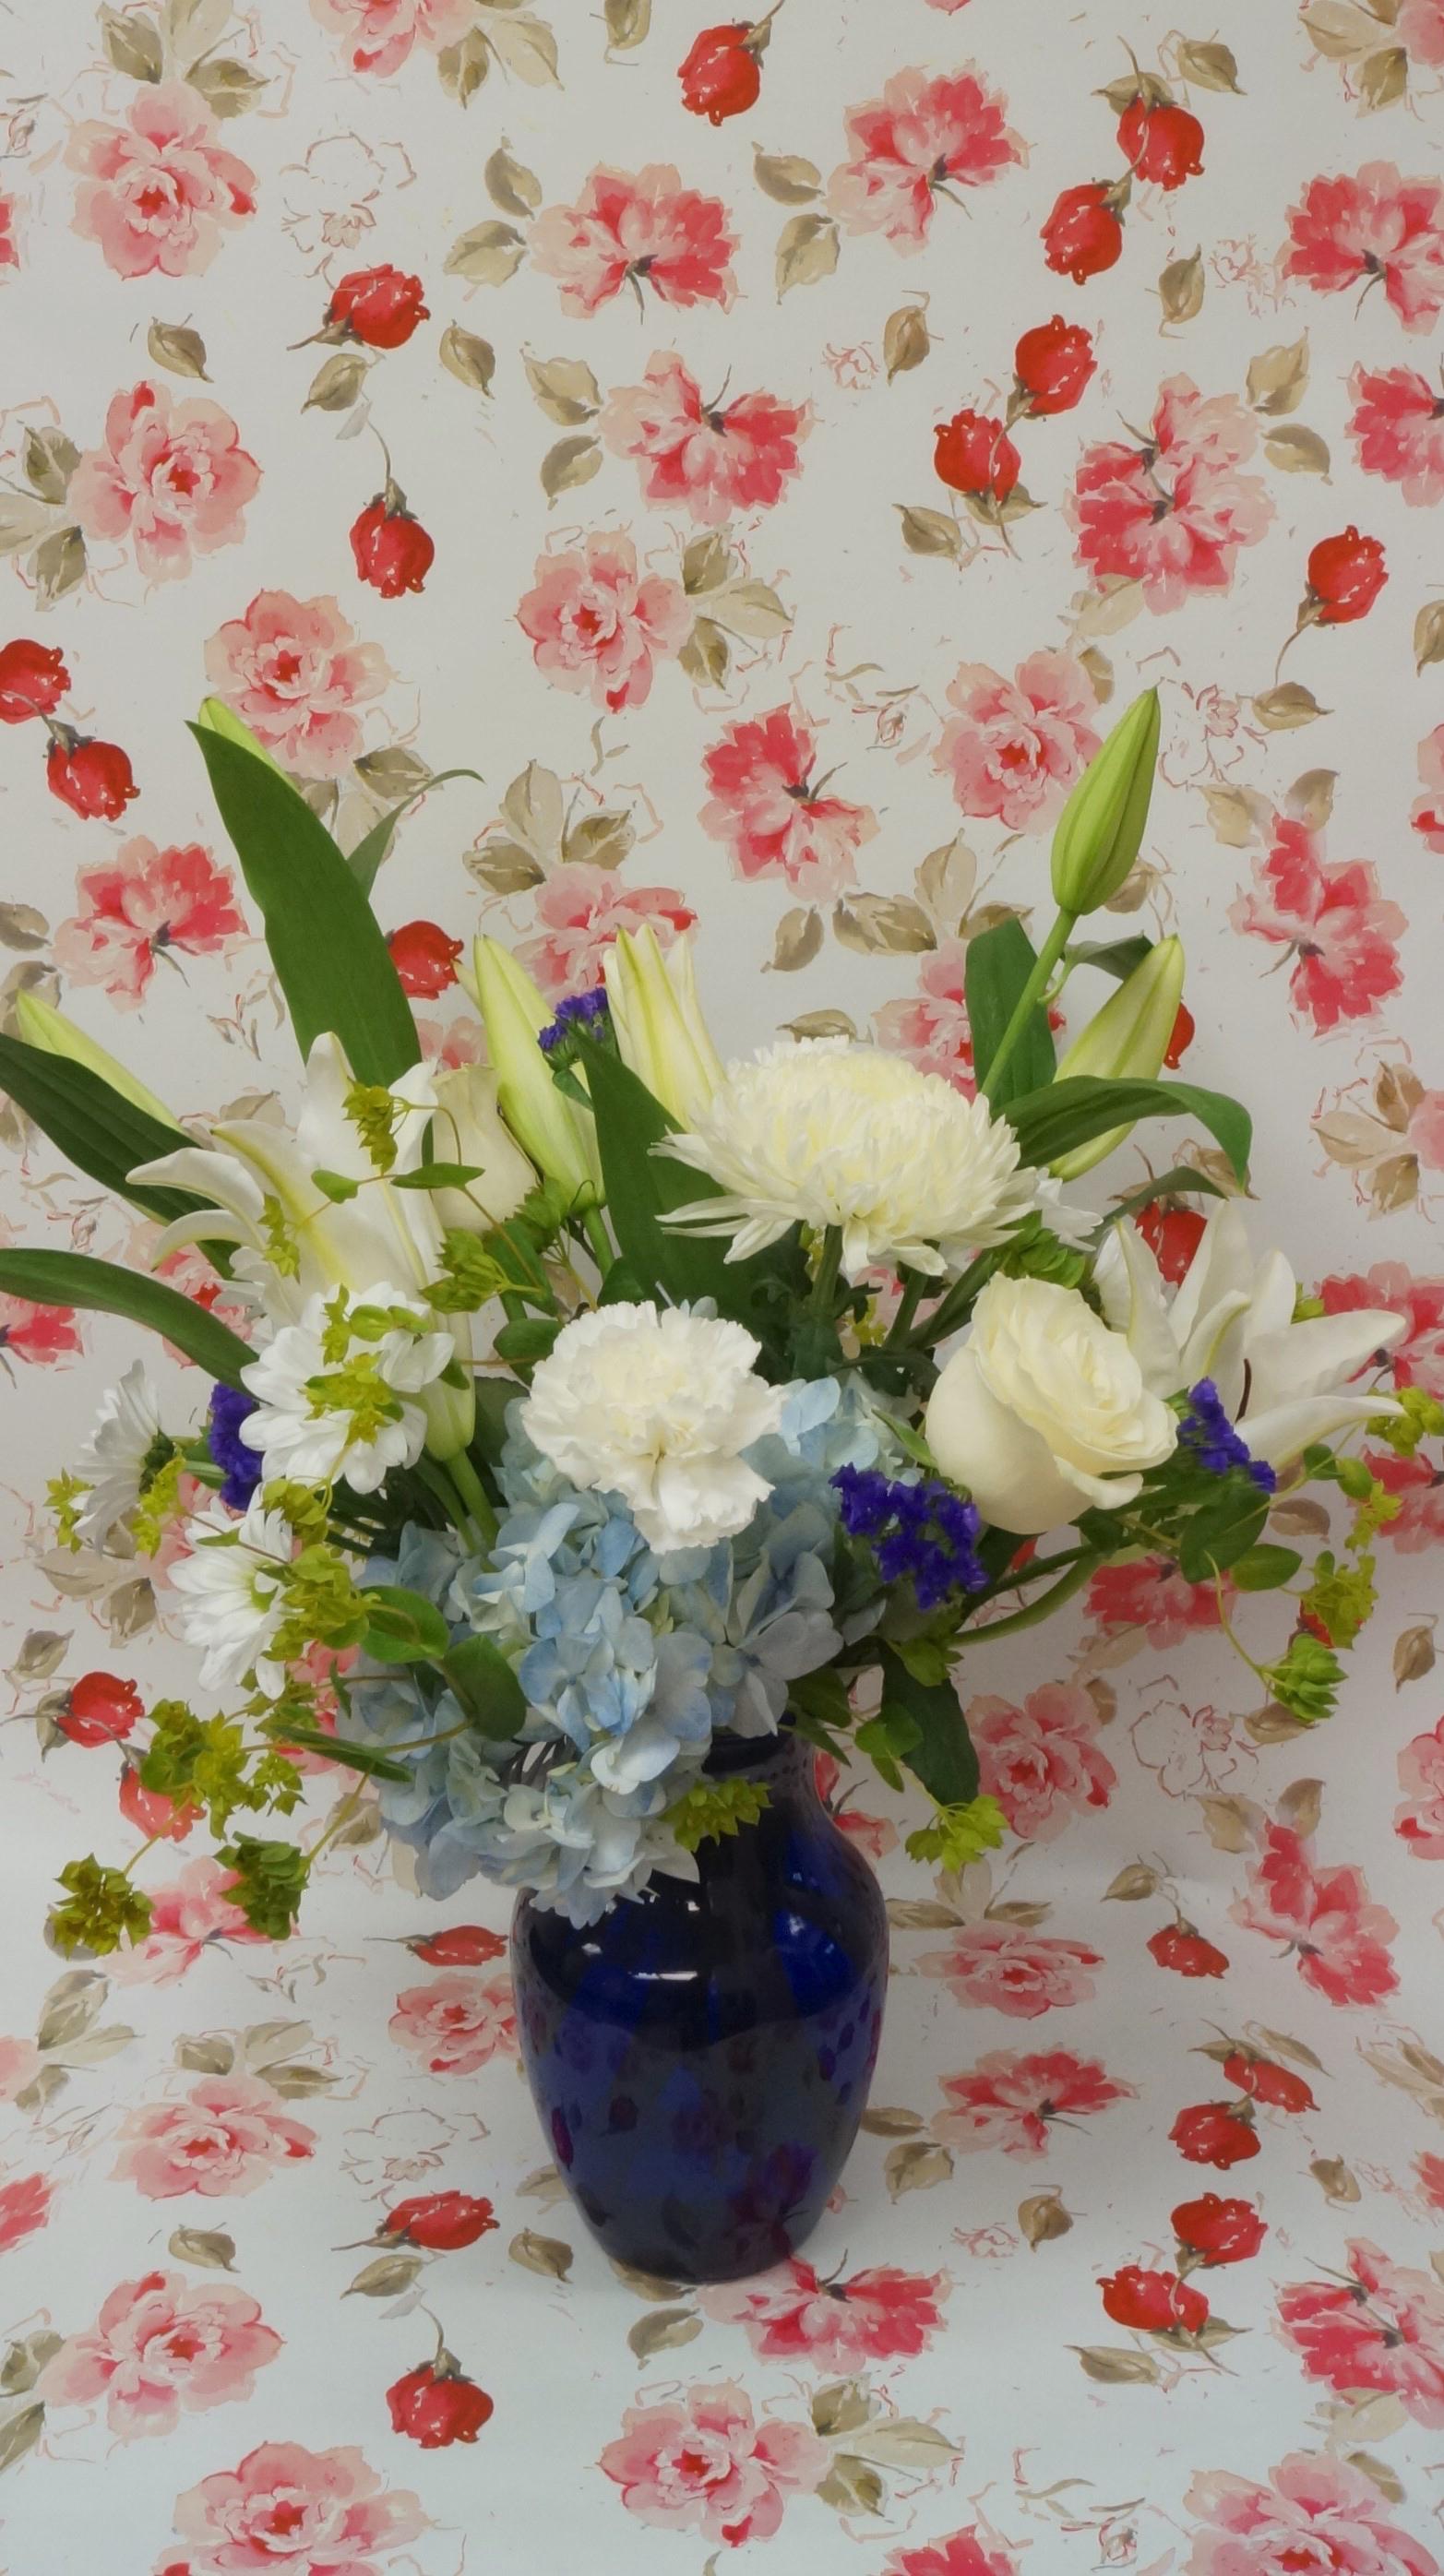 reba_spring_beautifulinblue_floraldesign_spiritedtable1.jpg